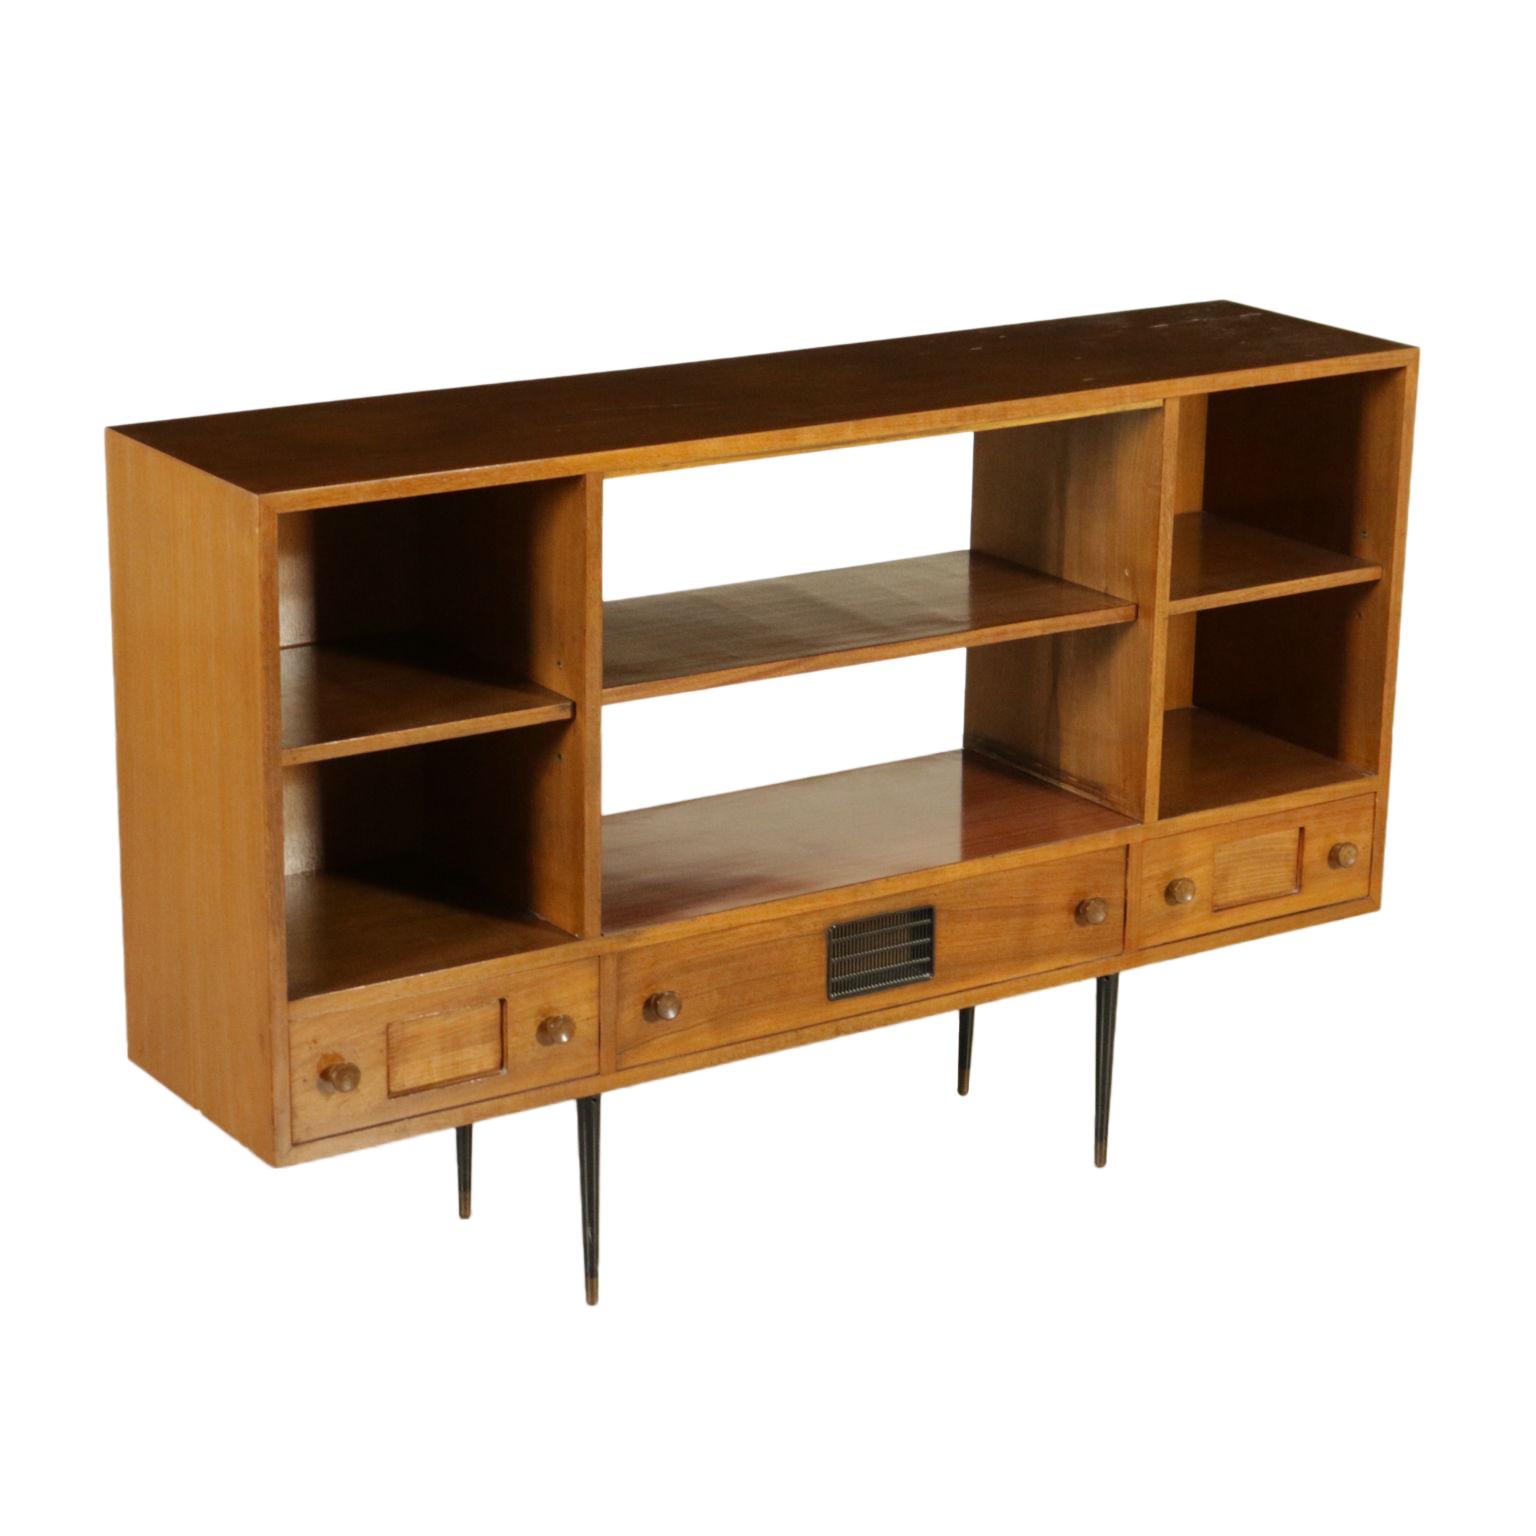 Mobile anni 60 mobilio modernariato for Mobili modernariato